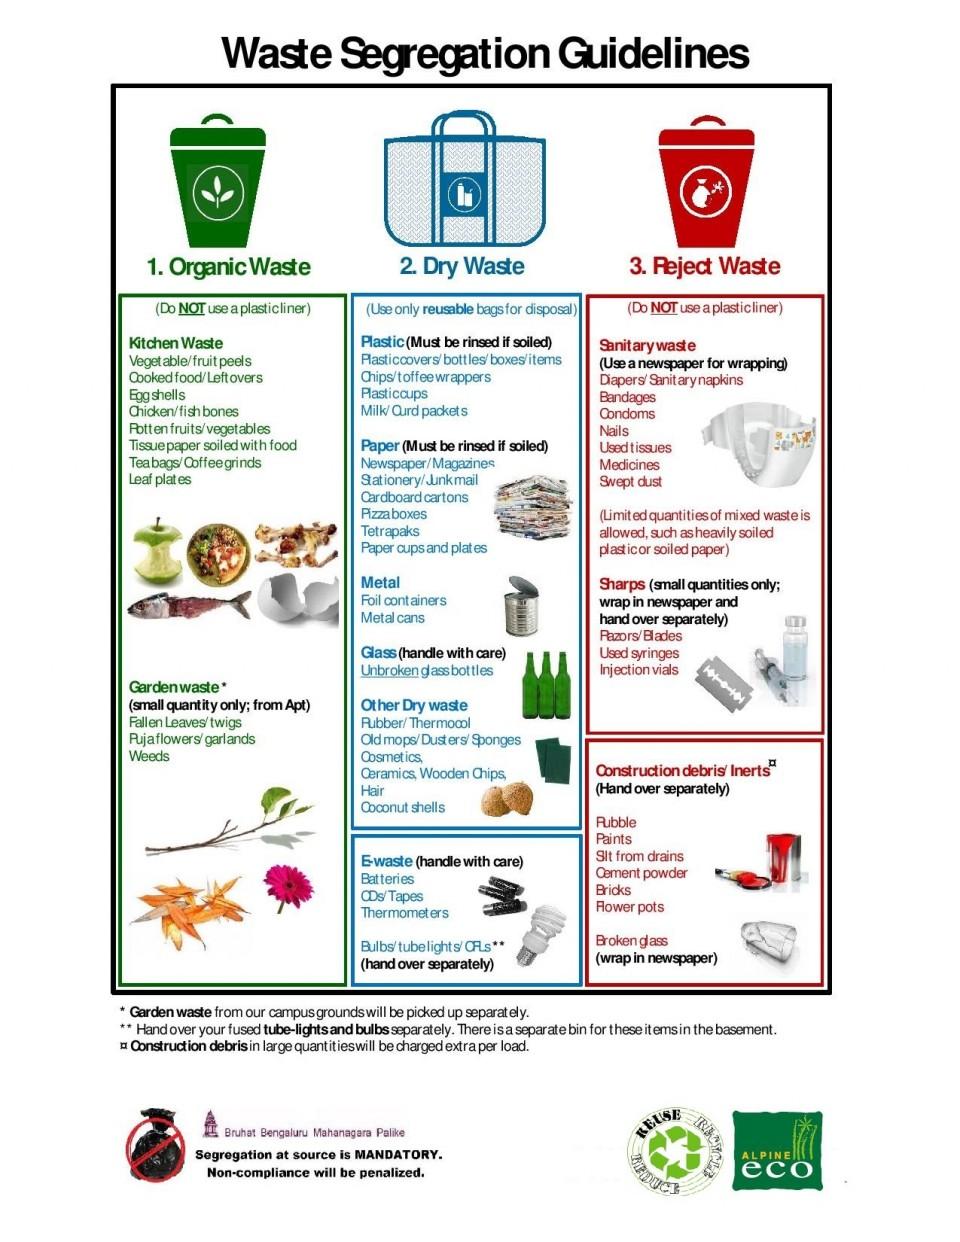 004 Essay Example20segregation20handout Segregating Fascinating Waste Introduction In School 960